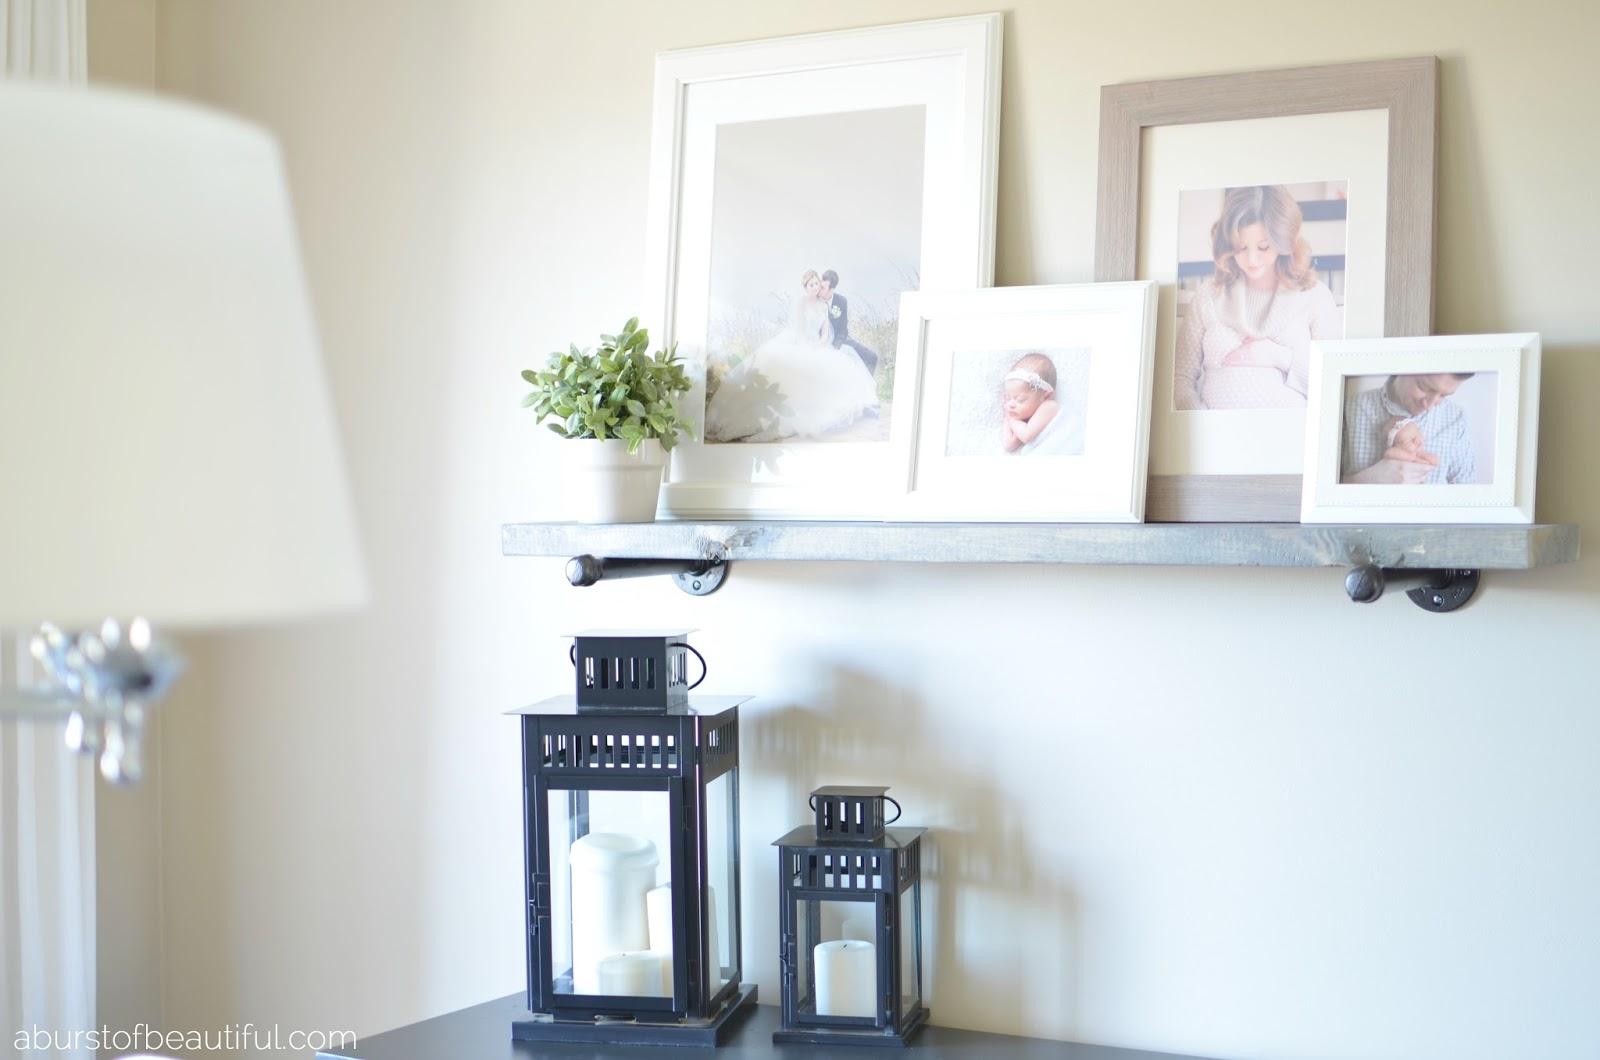 A Burst of Beautiful - DIY Industrial Shelf